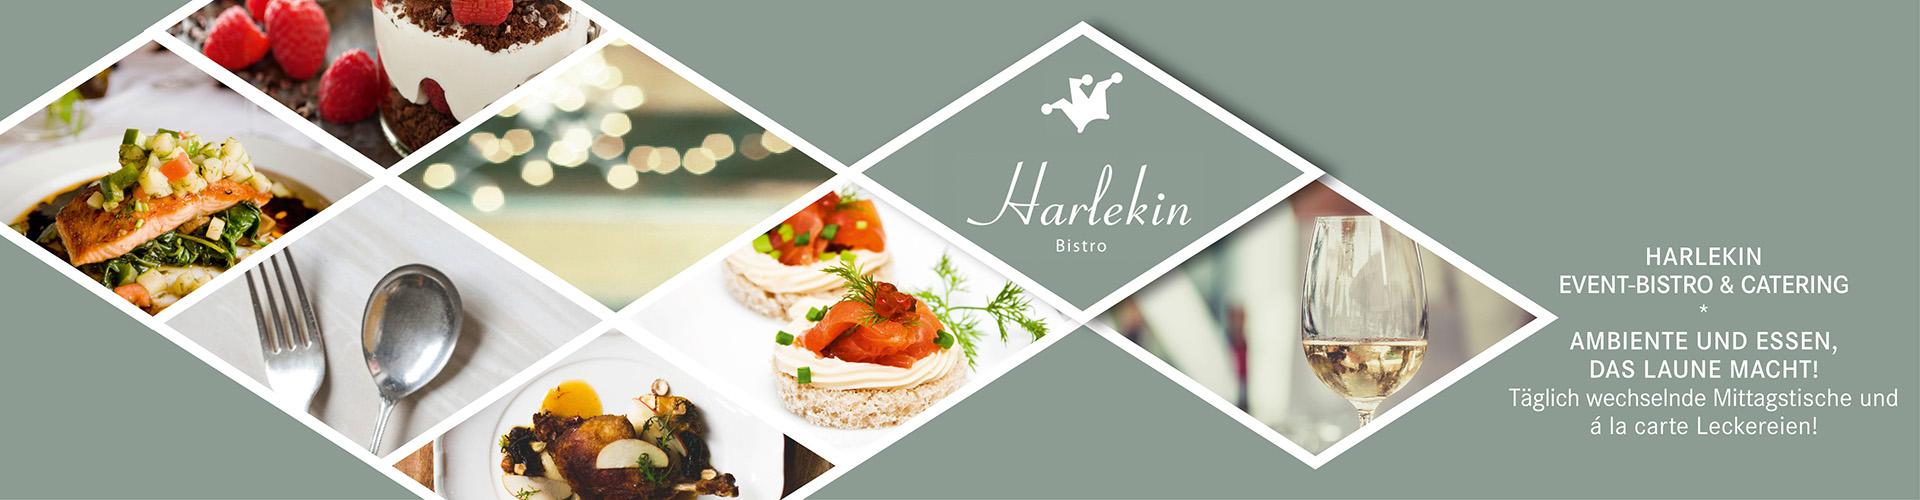 Harlekin_Header_Bankett